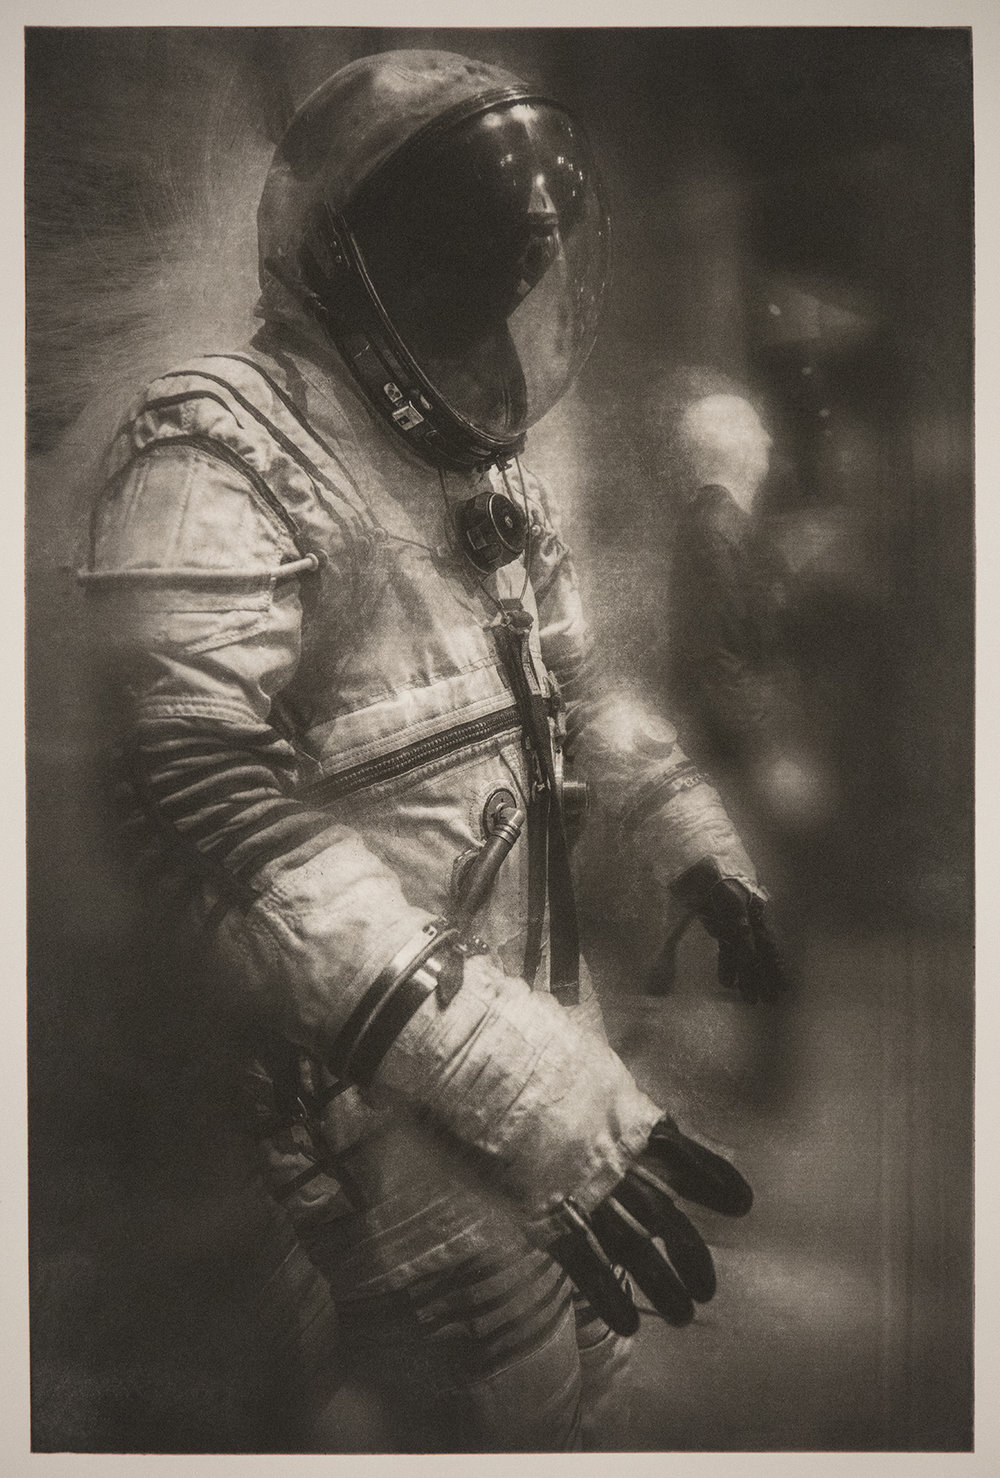 SOKOL Escape Suit for the Soviet Soyuz Missions